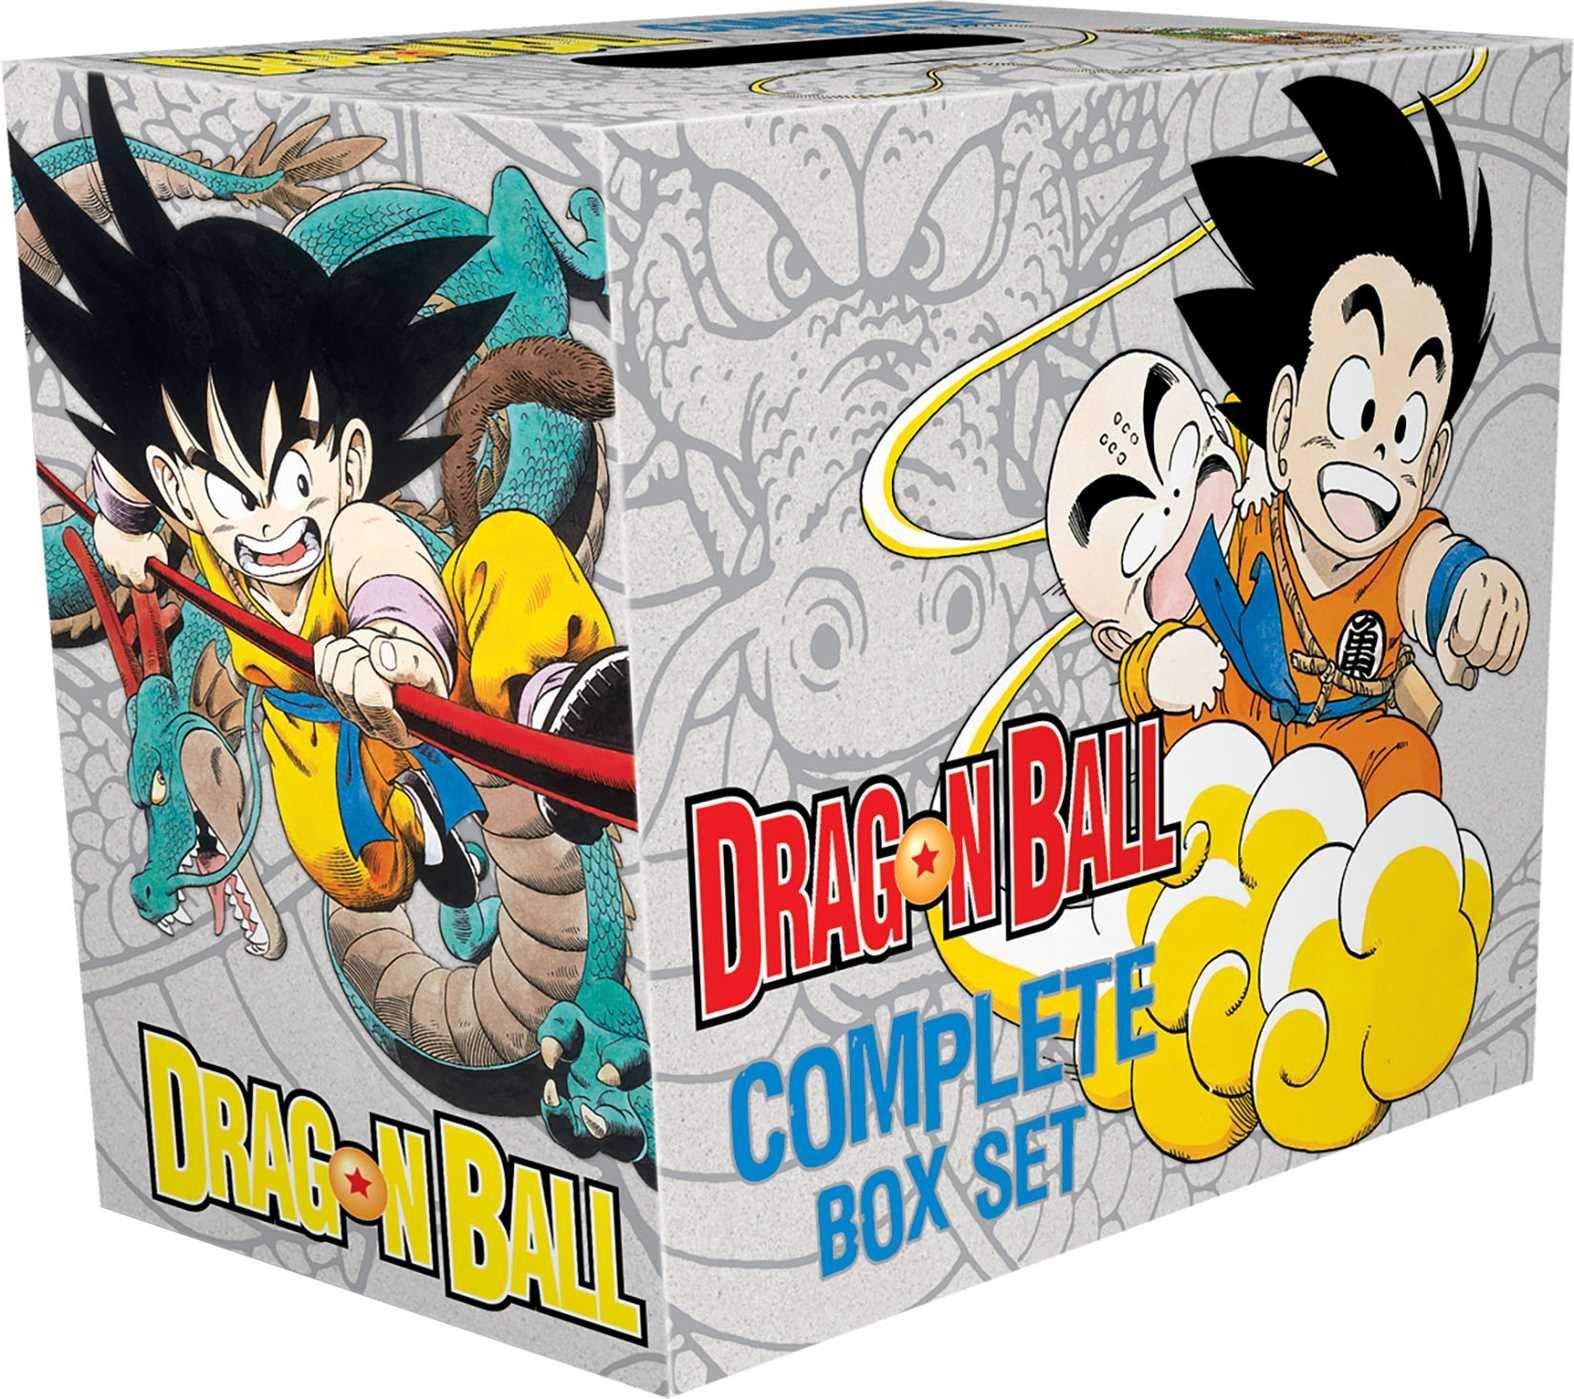 Dragon Ball Complete Box Set: Vols. 1-16 with premium by VIZ Media LLC